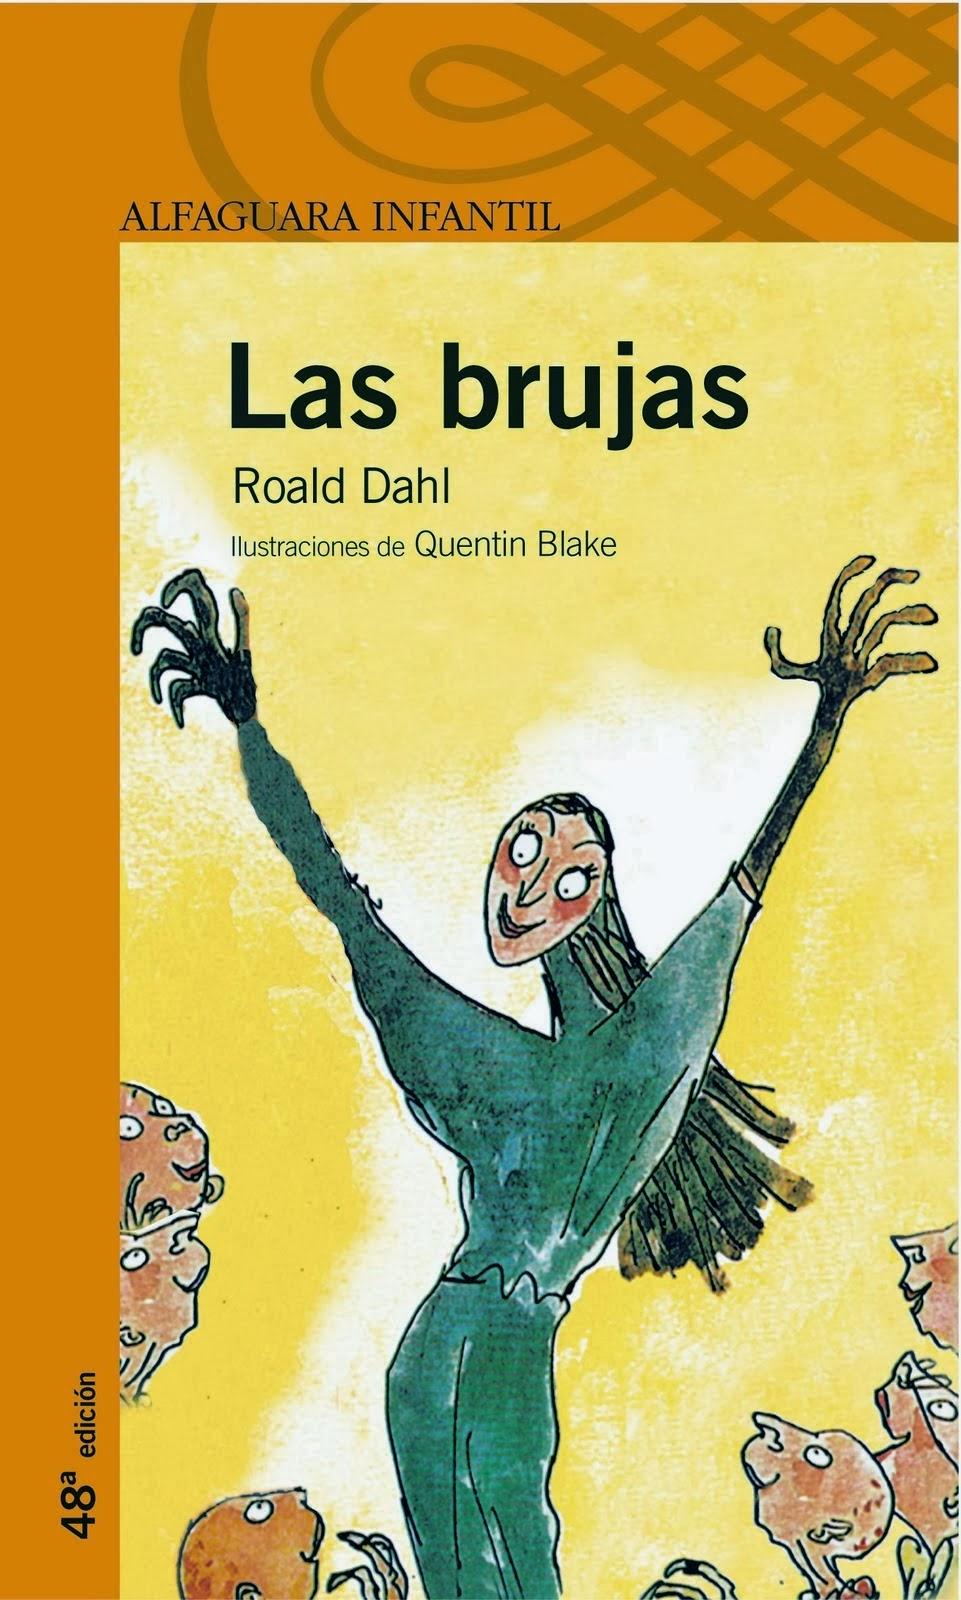 Las brujas Roald Dahl